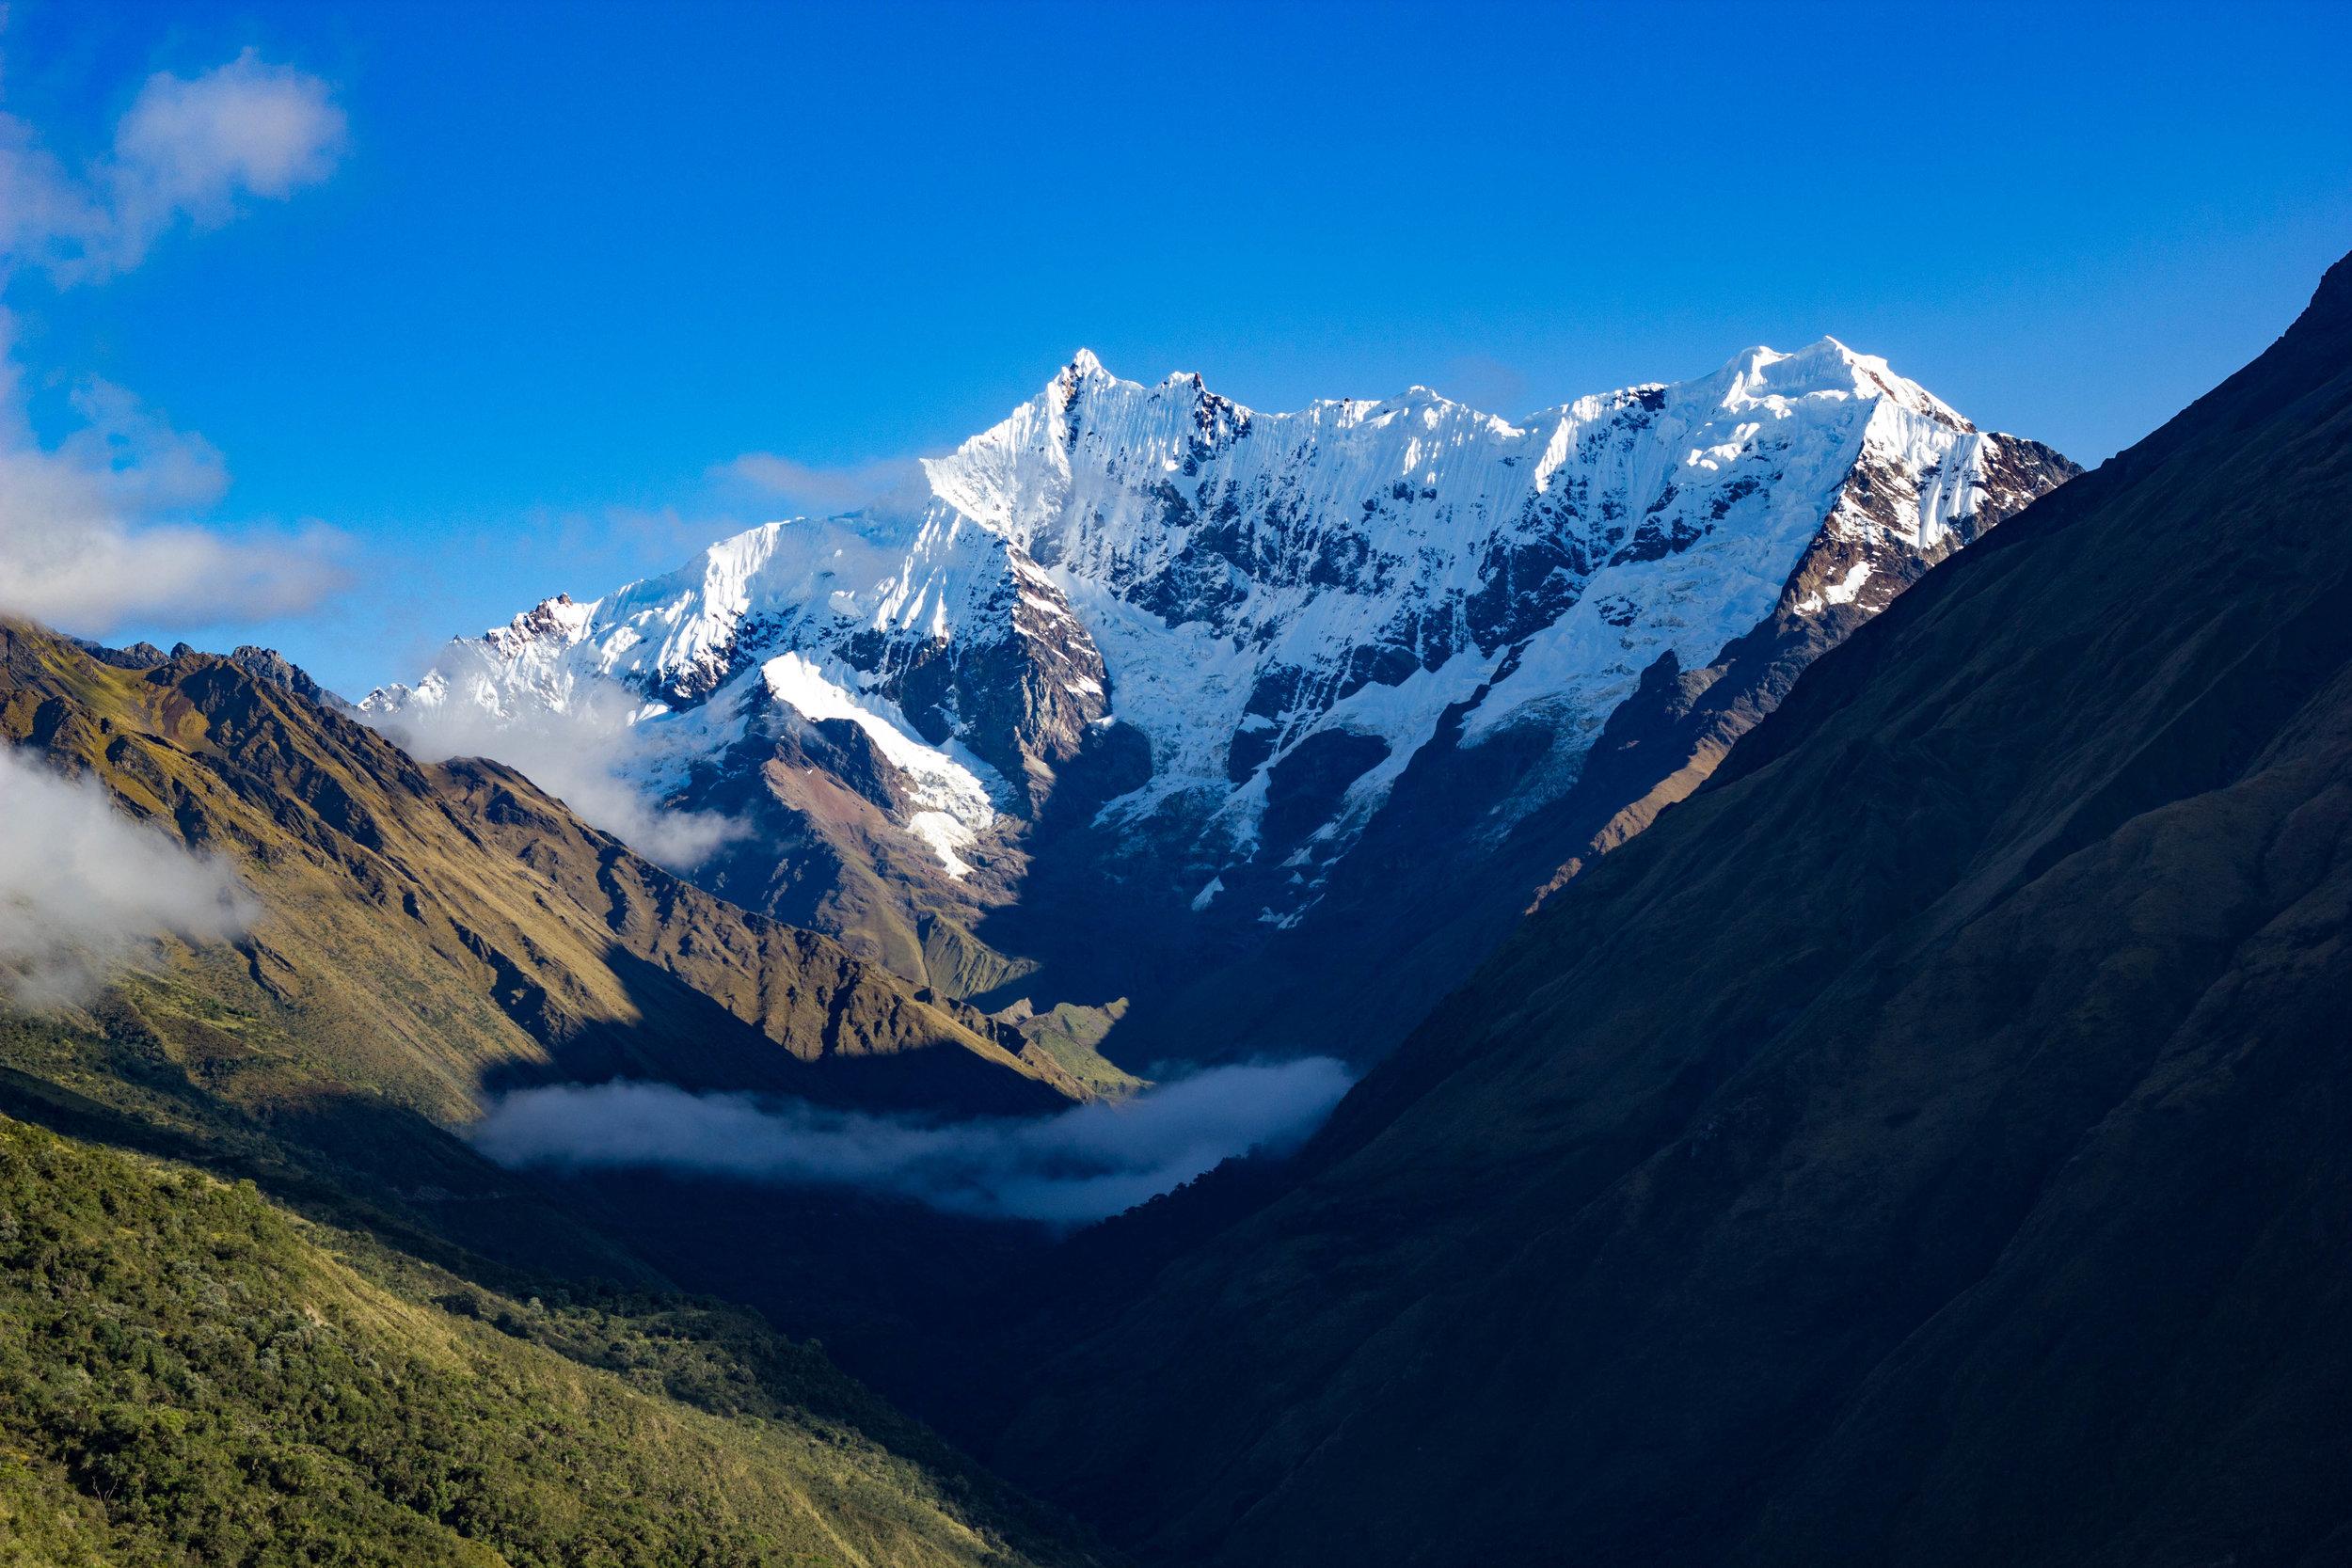 Abril en Peru - Distrito de Mollepata, Mount Salkantay, Machu Picchu